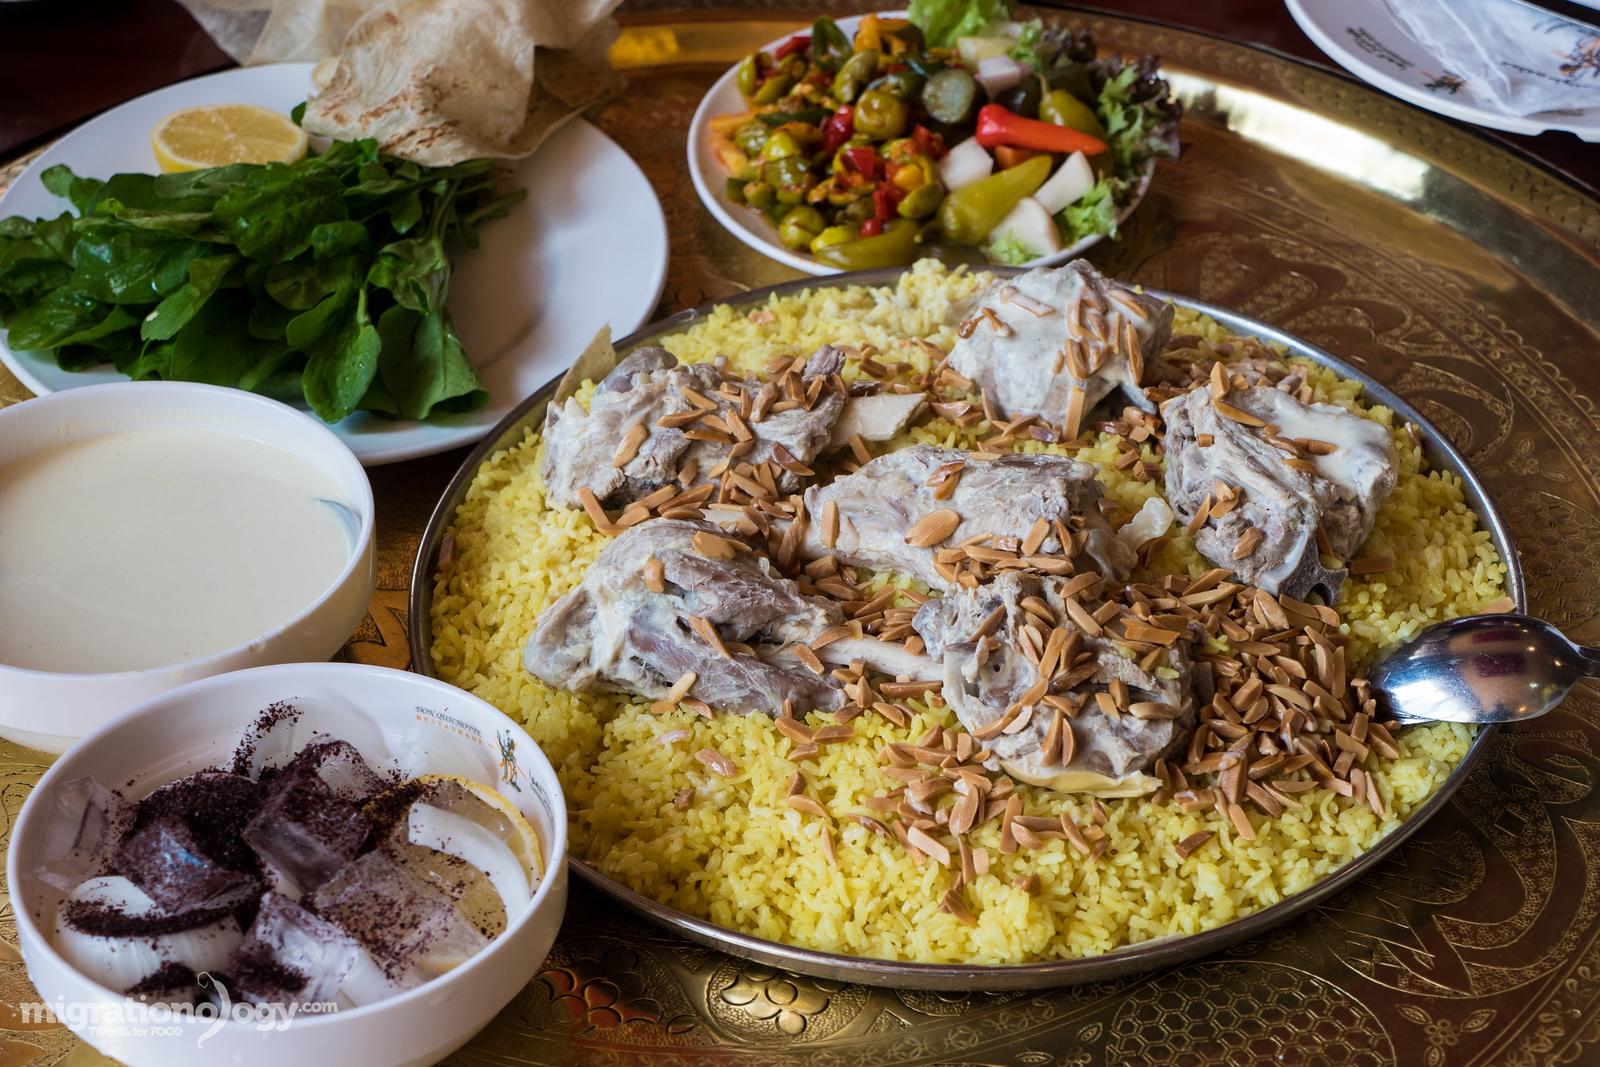 mansaf in Jordan